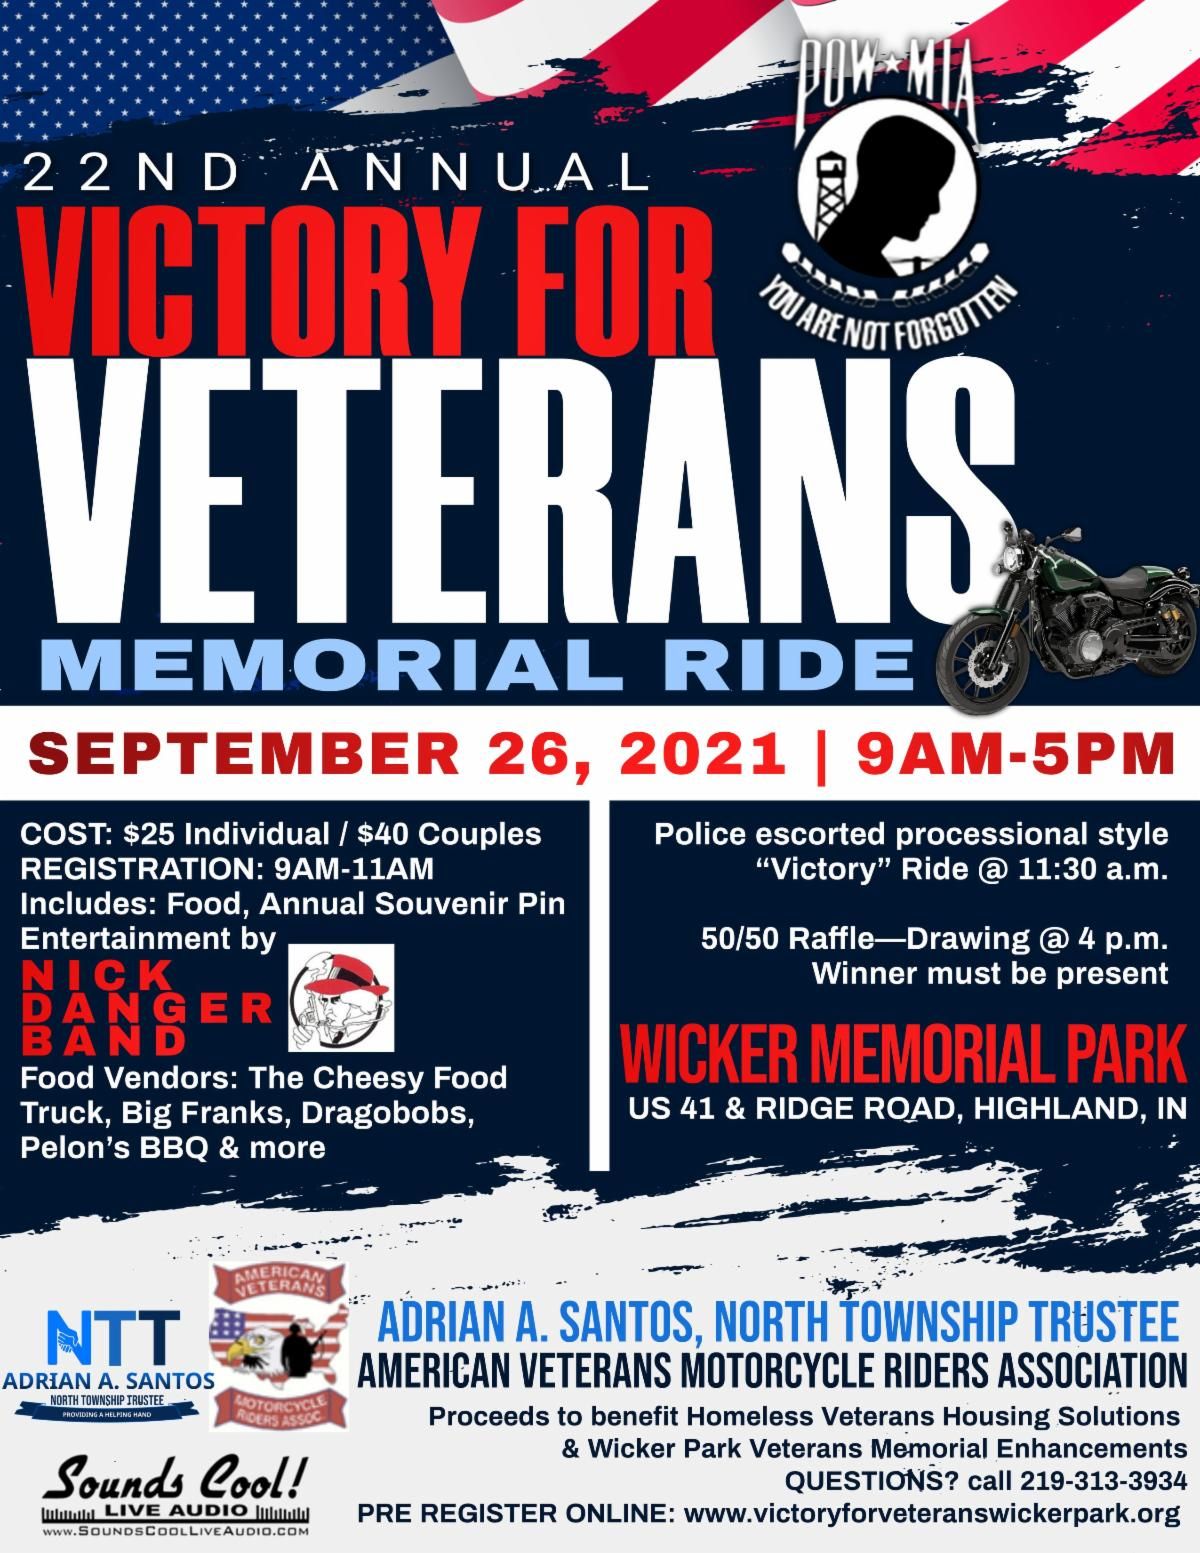 Victory for Veterans Memorial Ride 2021.jpg